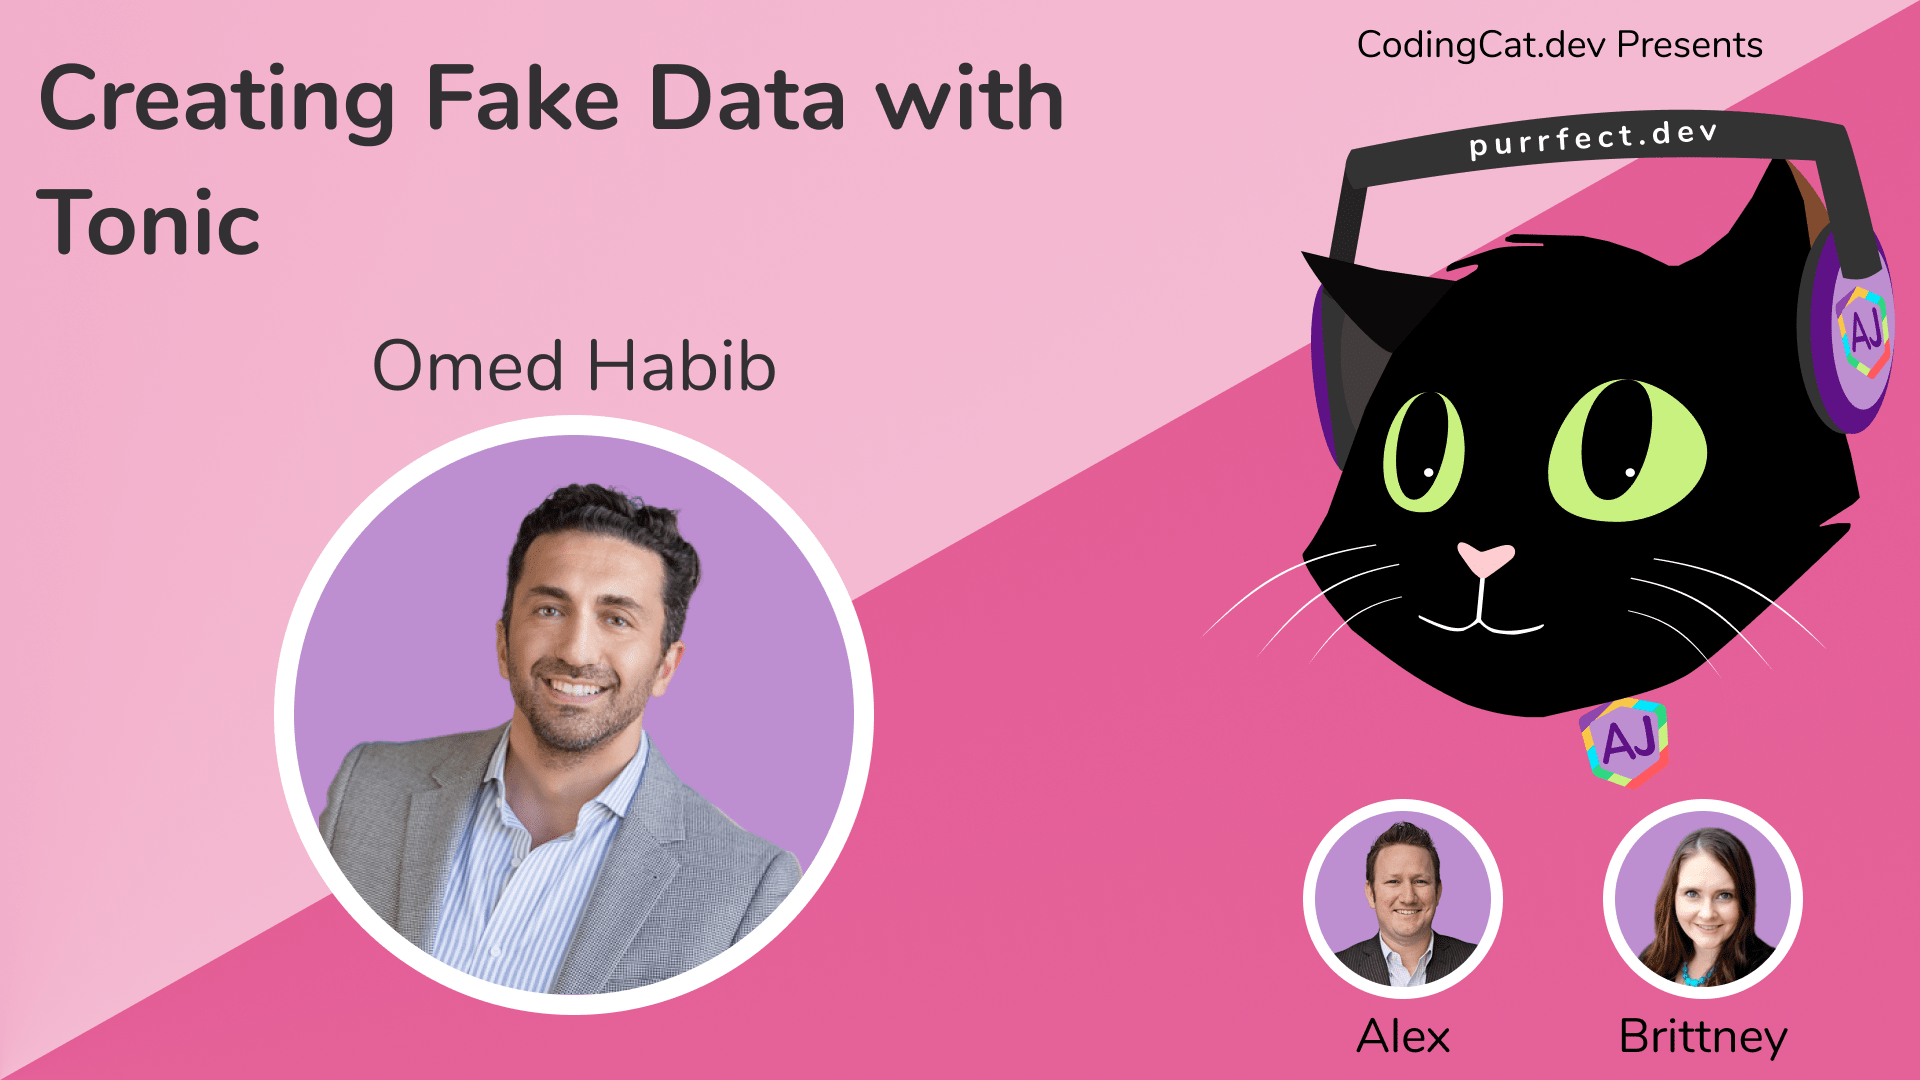 1.38 - Creating Fake Data with Tonic